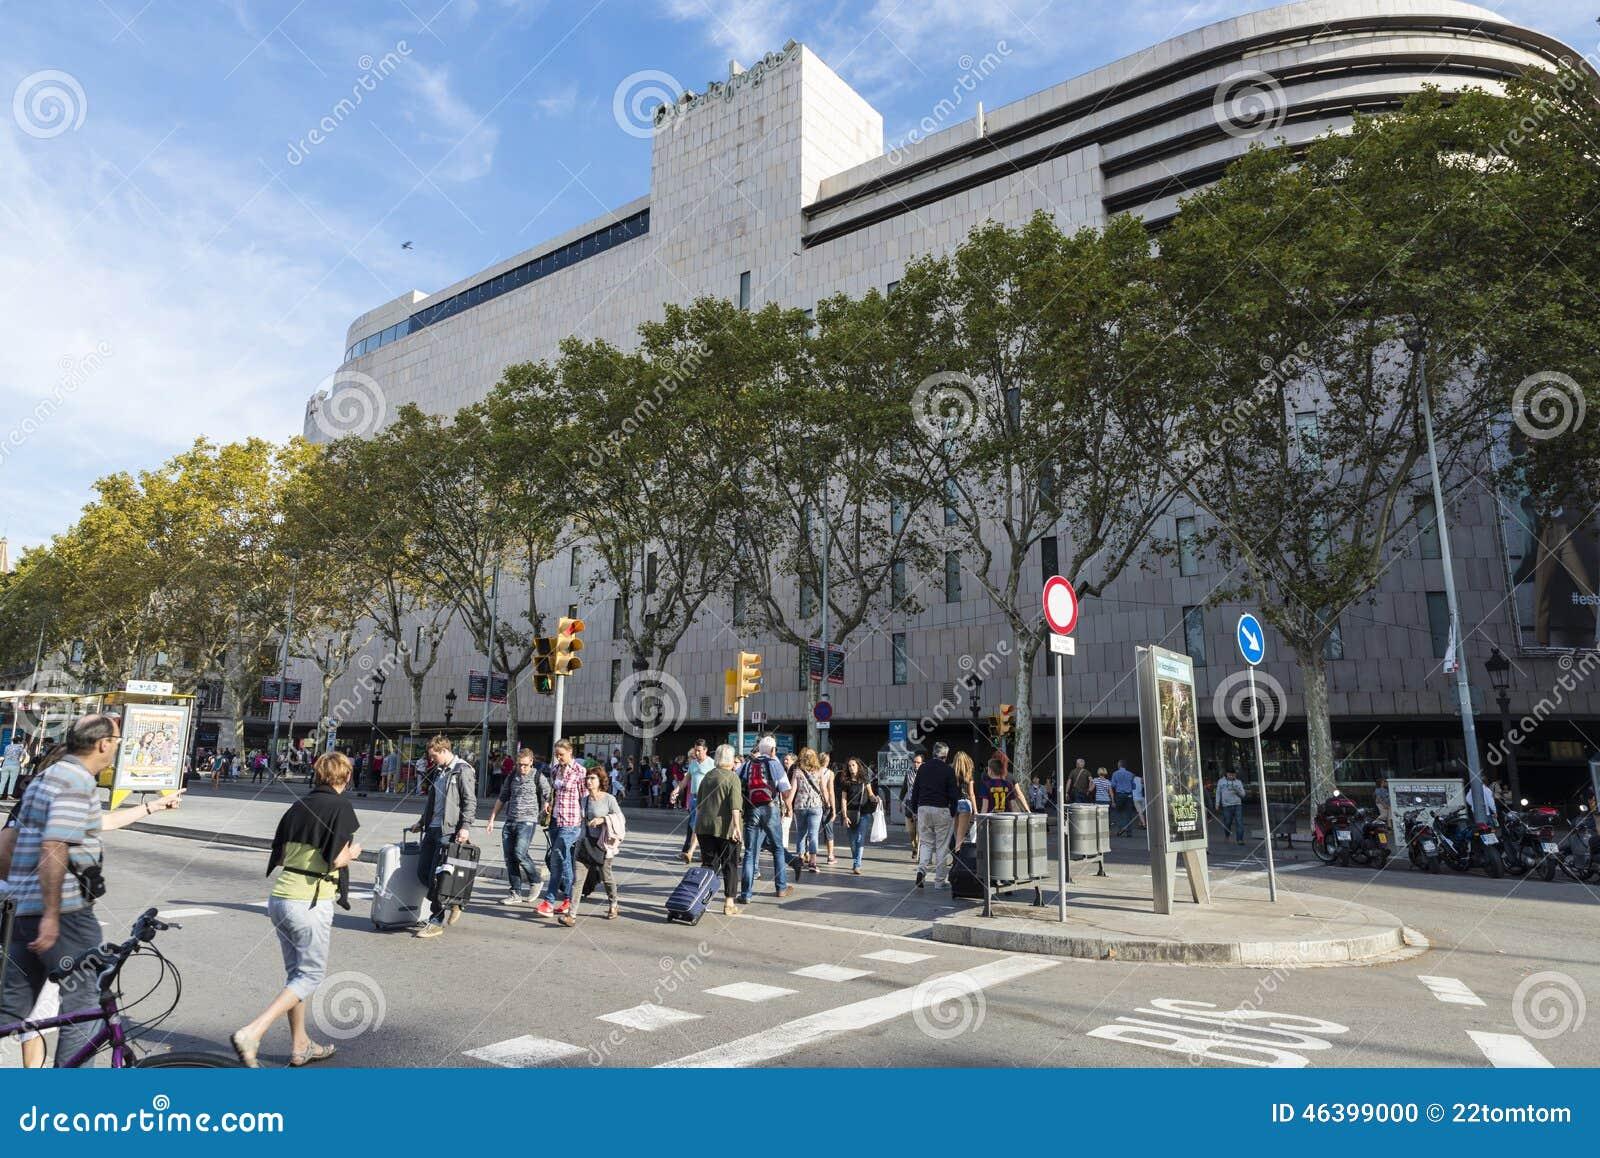 Shopping Center El Corte Ingles Barcelona Editorial Image